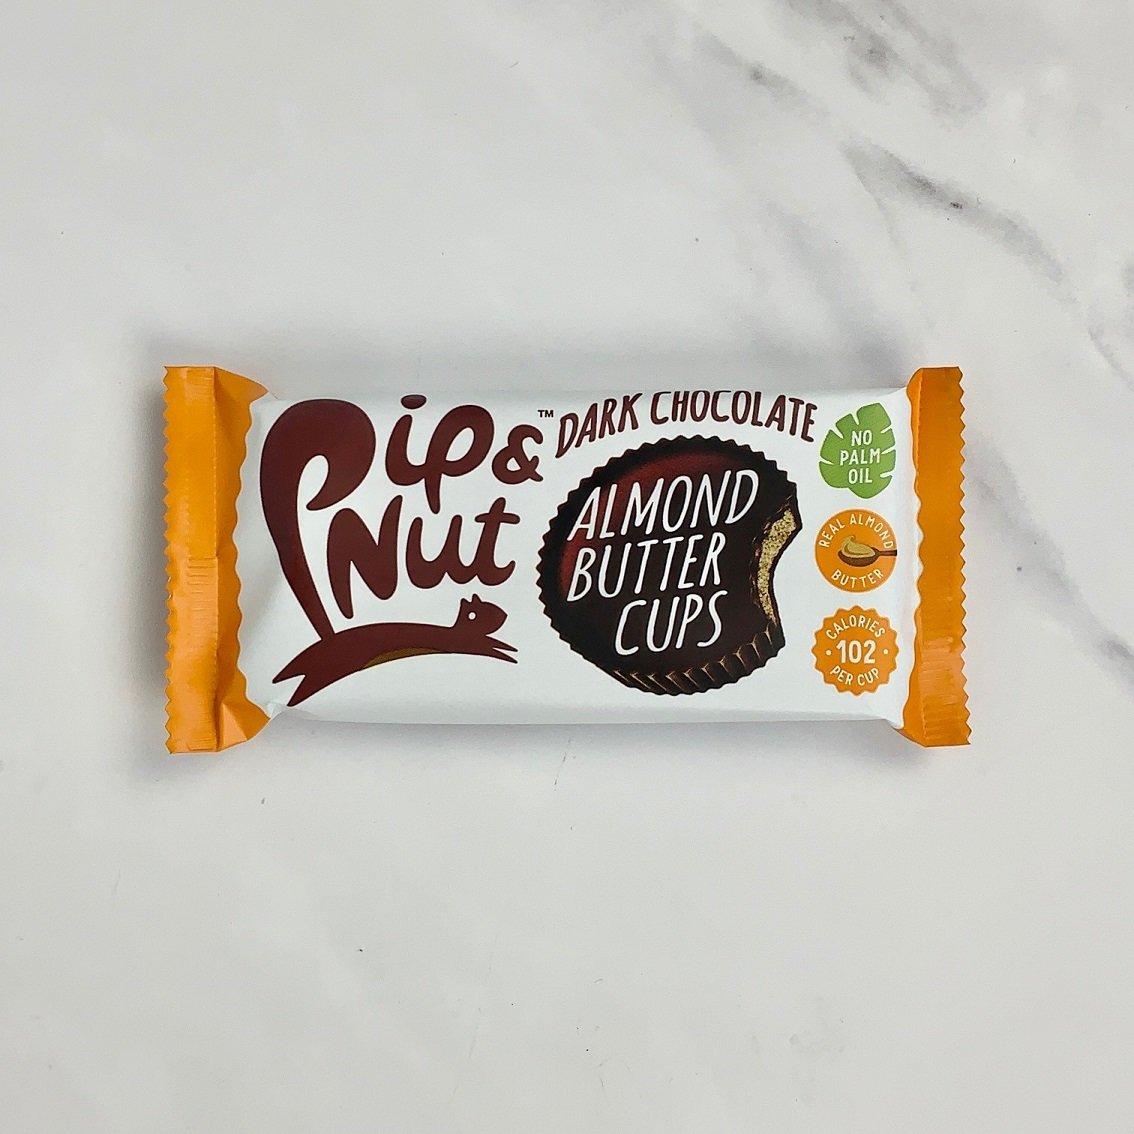 Pip & Nut Milk Chocolate Peanut Butter Cups – 15 x 34g